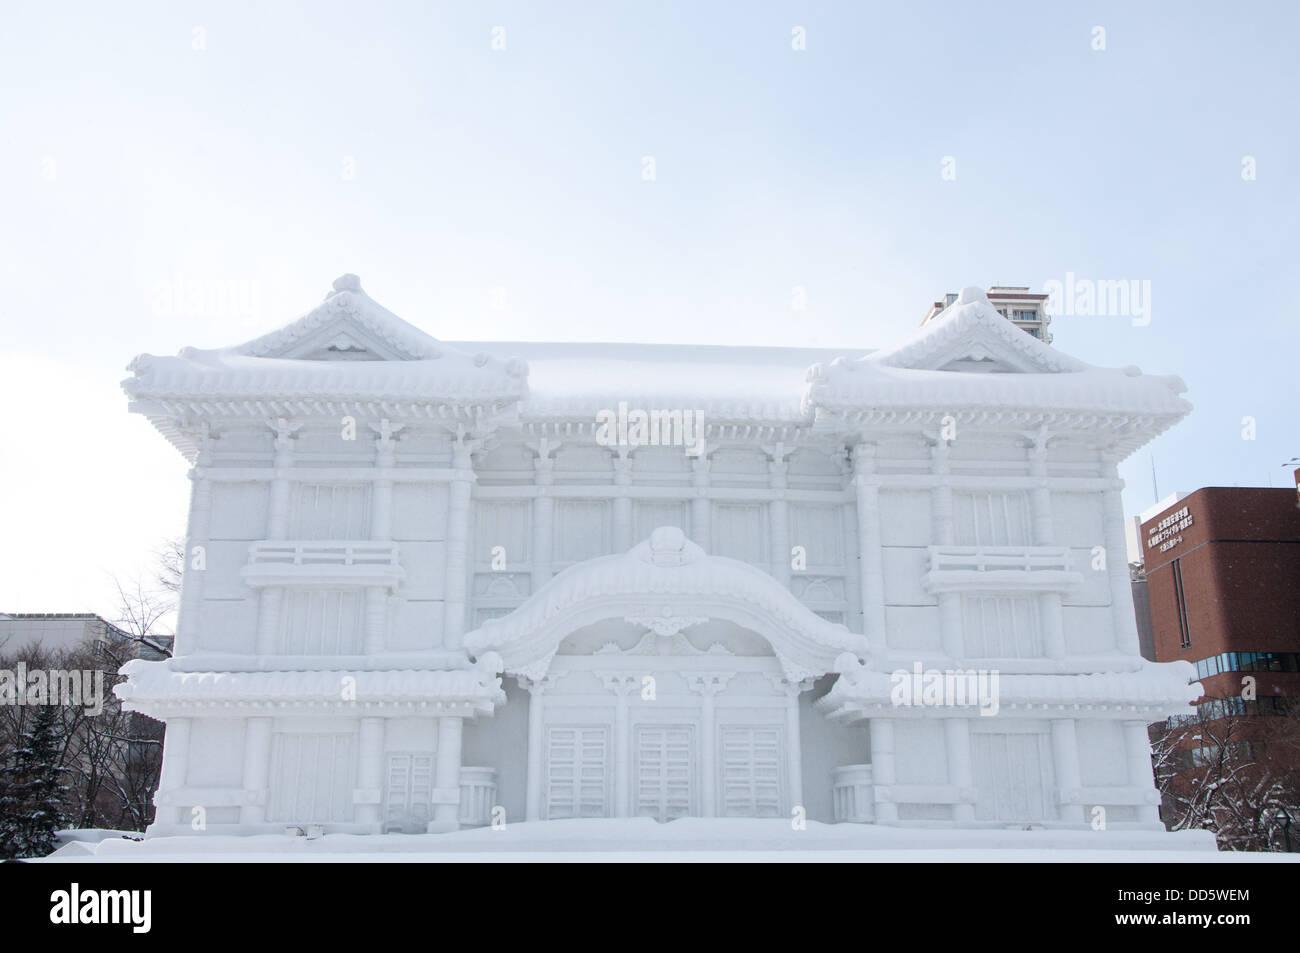 Sapporo, Japan - Feb. 9 2013 : Snow sculpture of Kabuki-za at Sapporo Snow Festival 2013 in Sapporo, Hokkaido, japan. - Stock Image